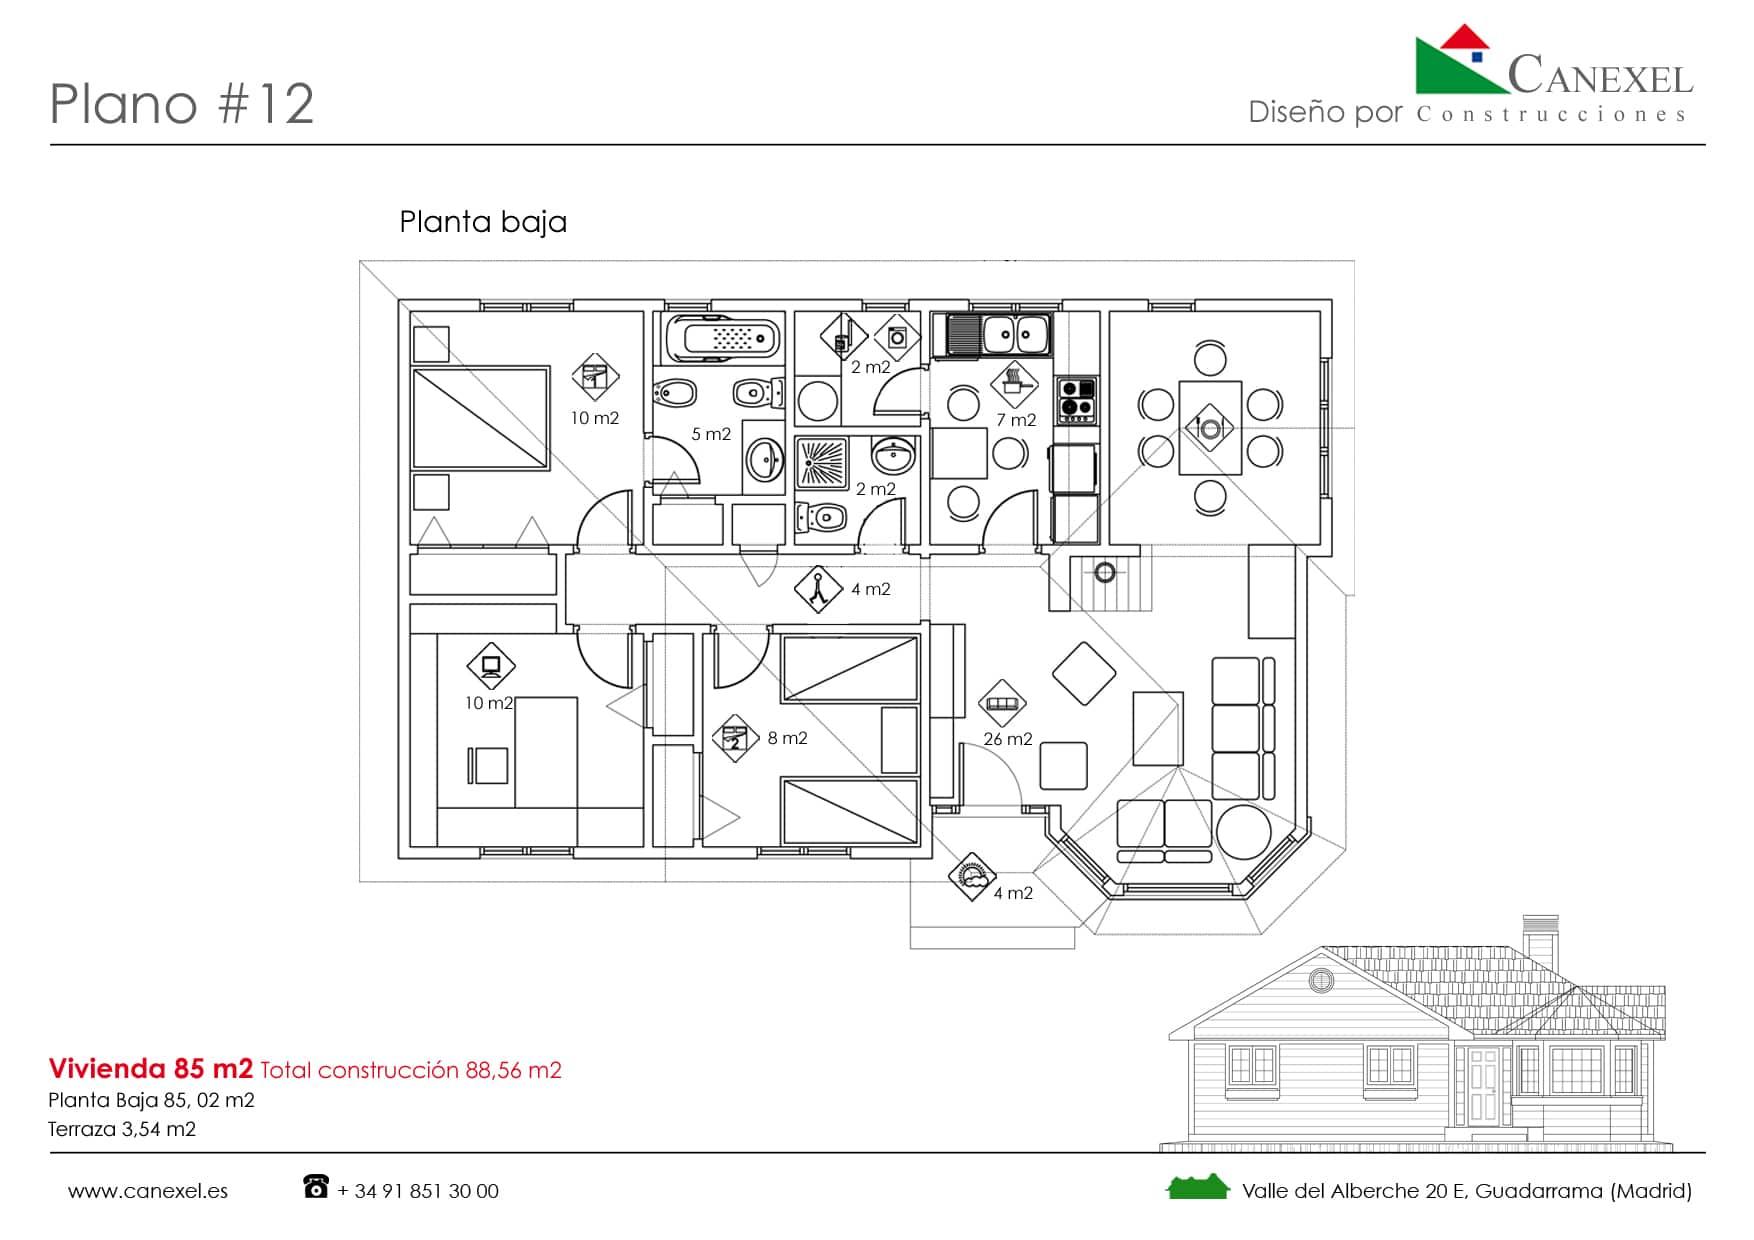 Planos de casas de una planta canexel for Casa moderna 80 metros cuadrados